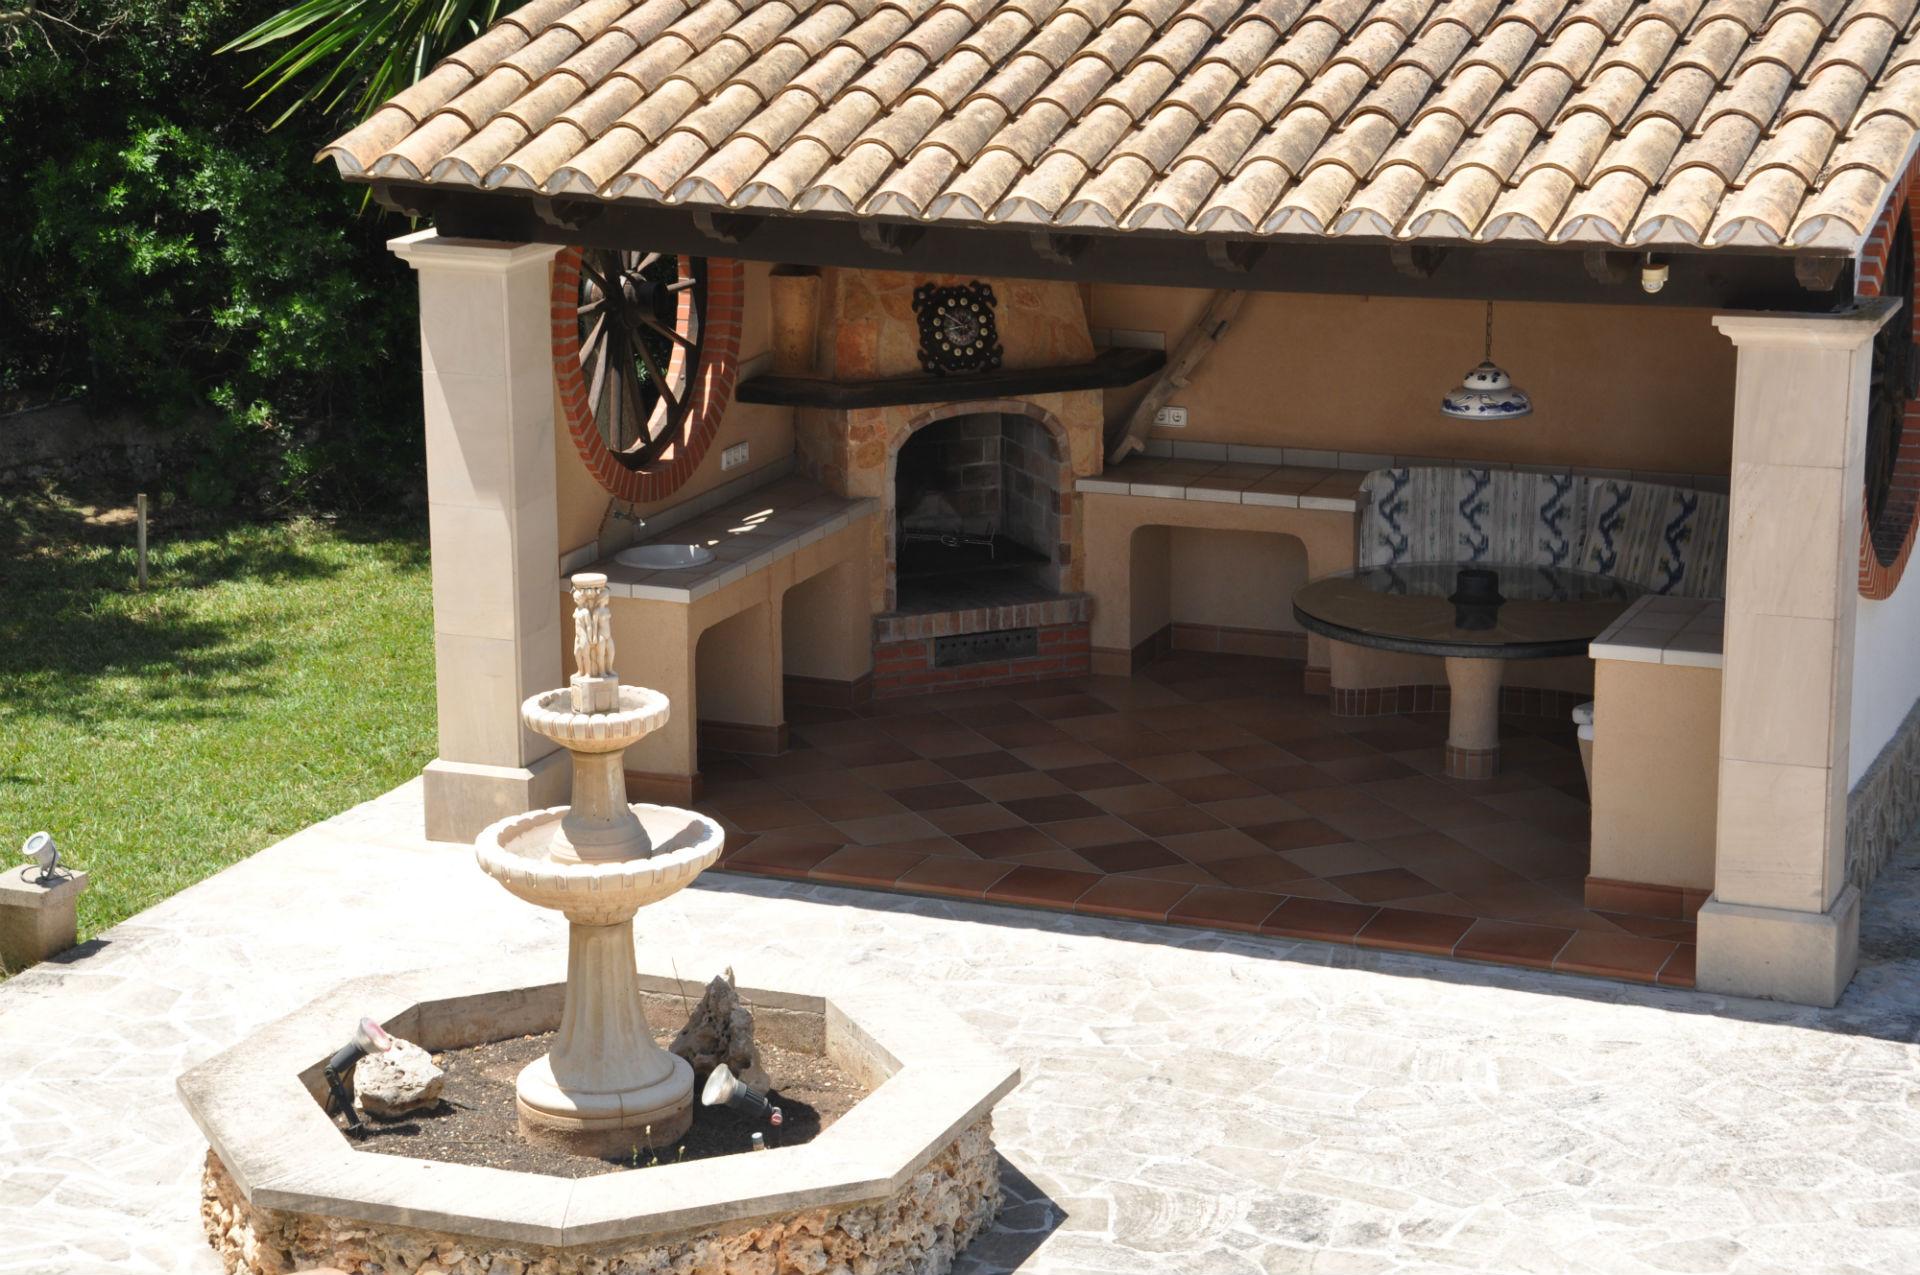 46 Villa Juliette